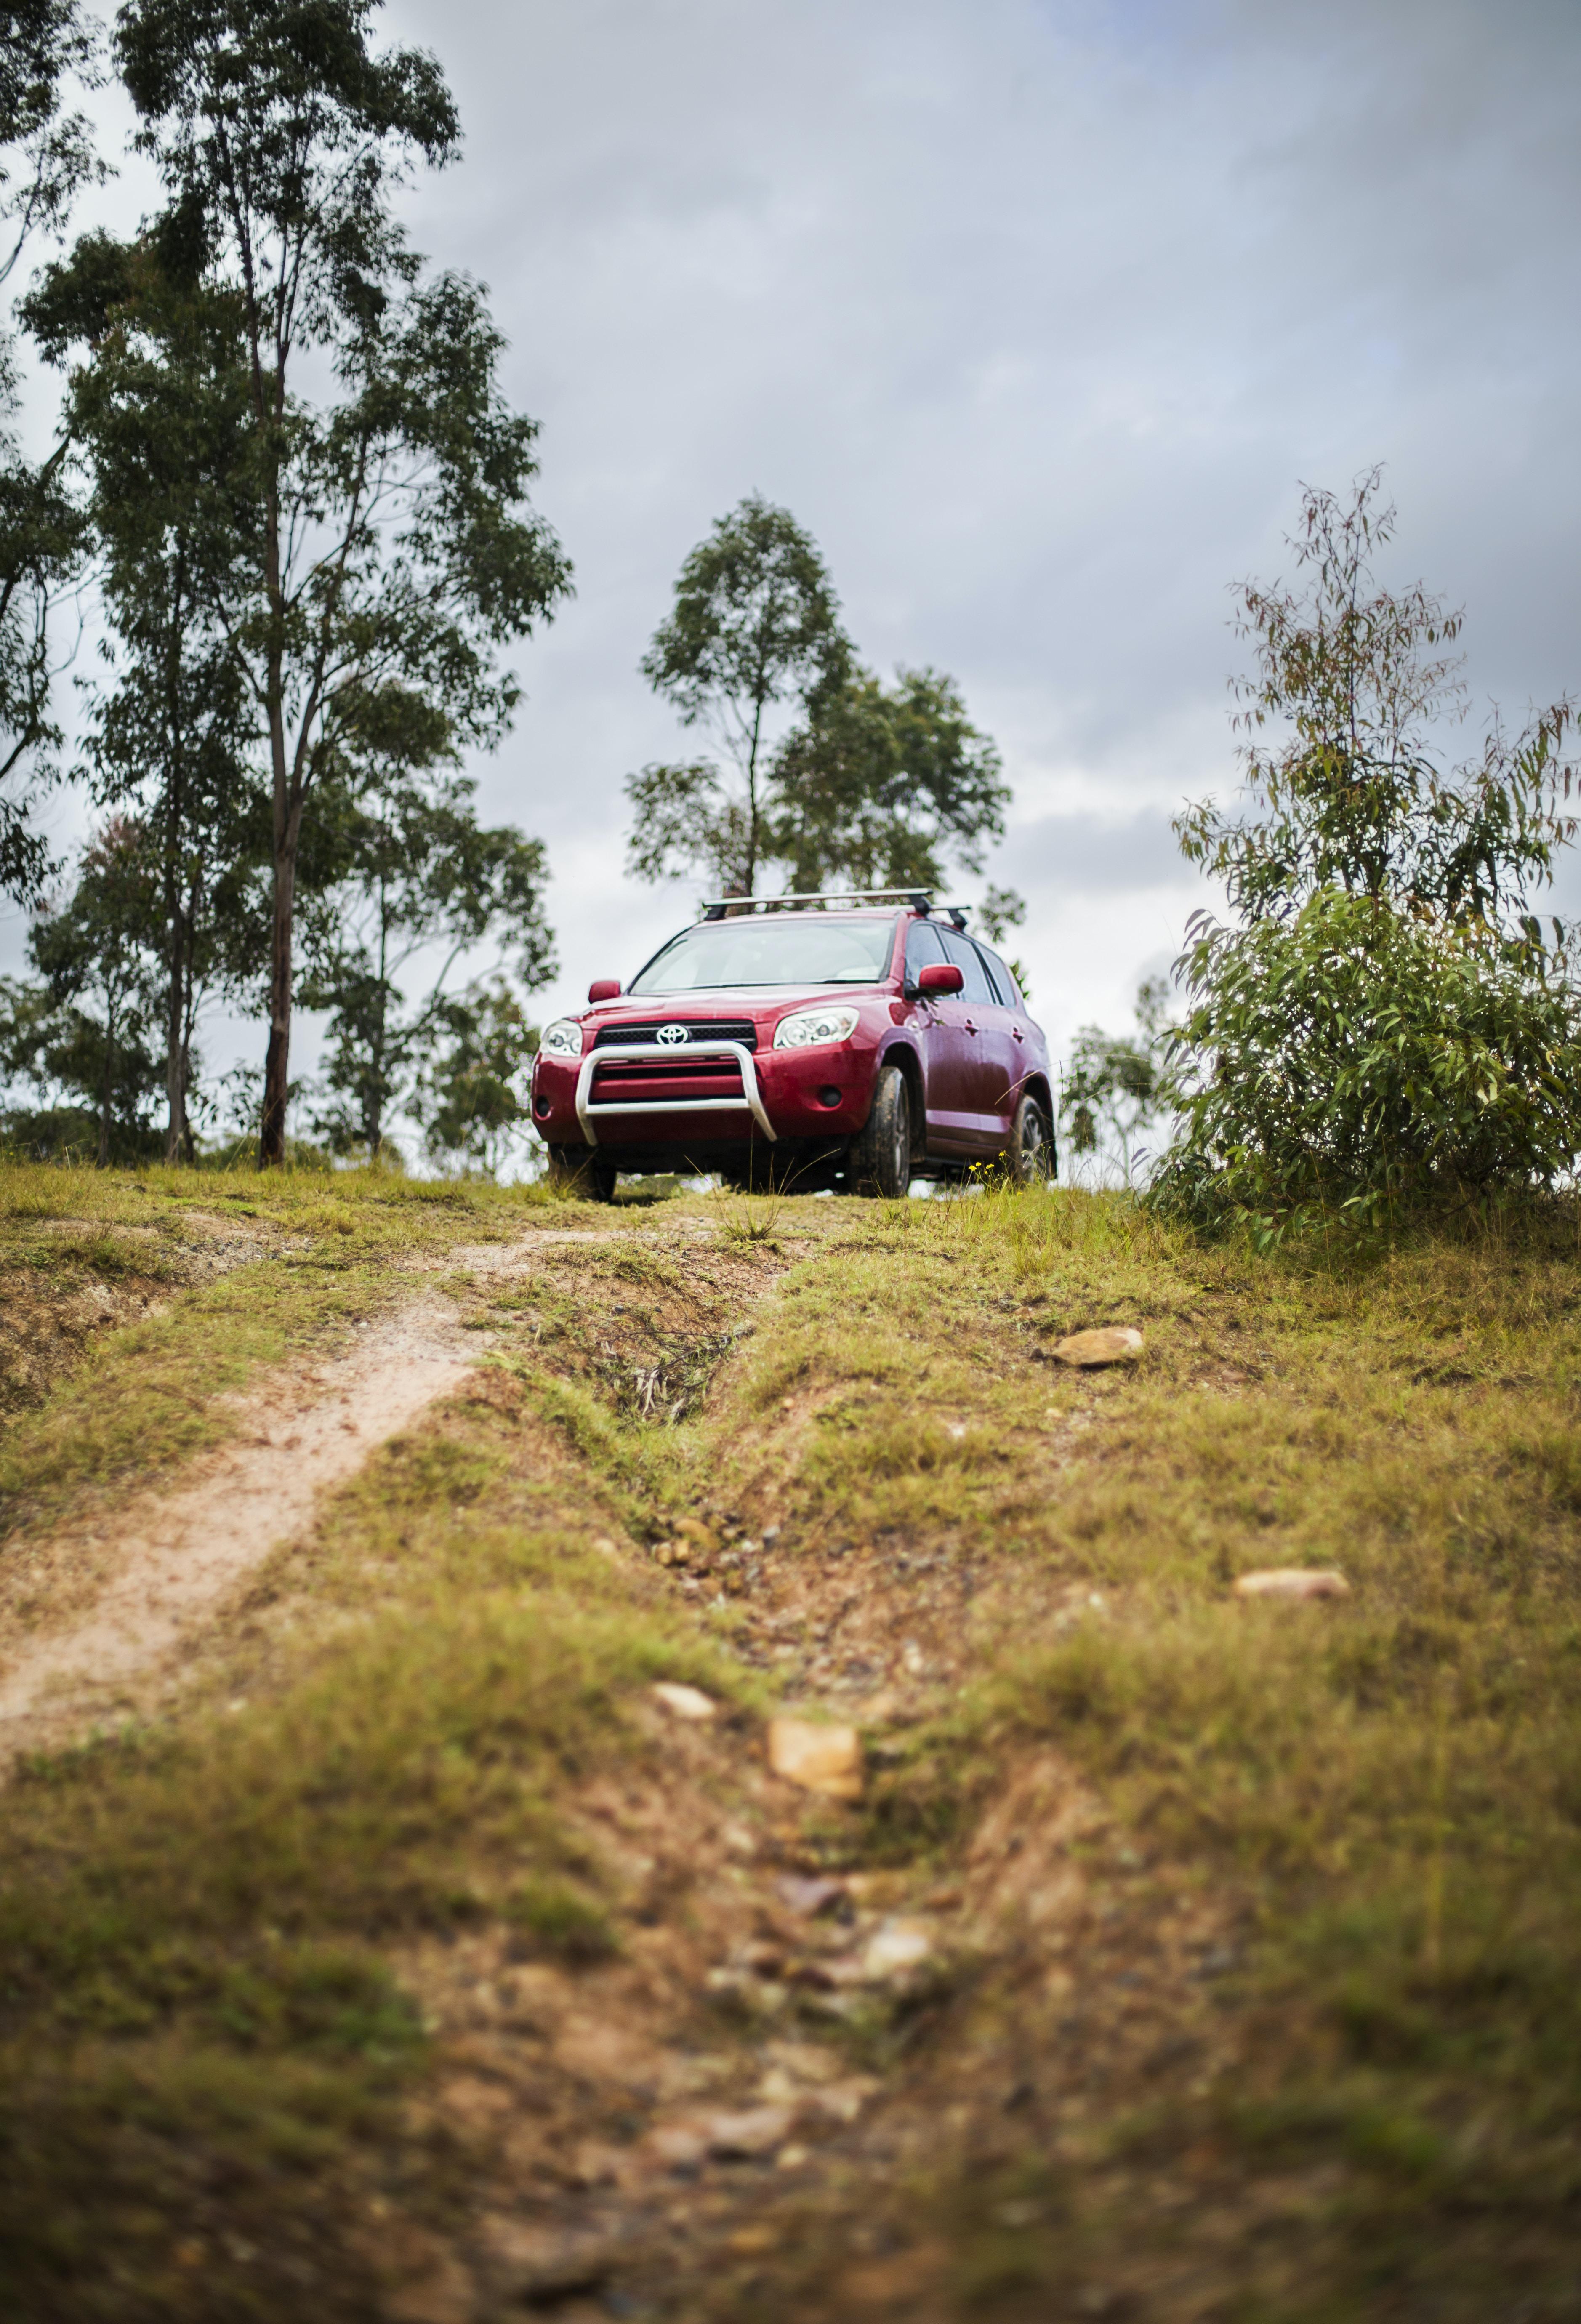 photo of red RAV 4 SUV on roadway